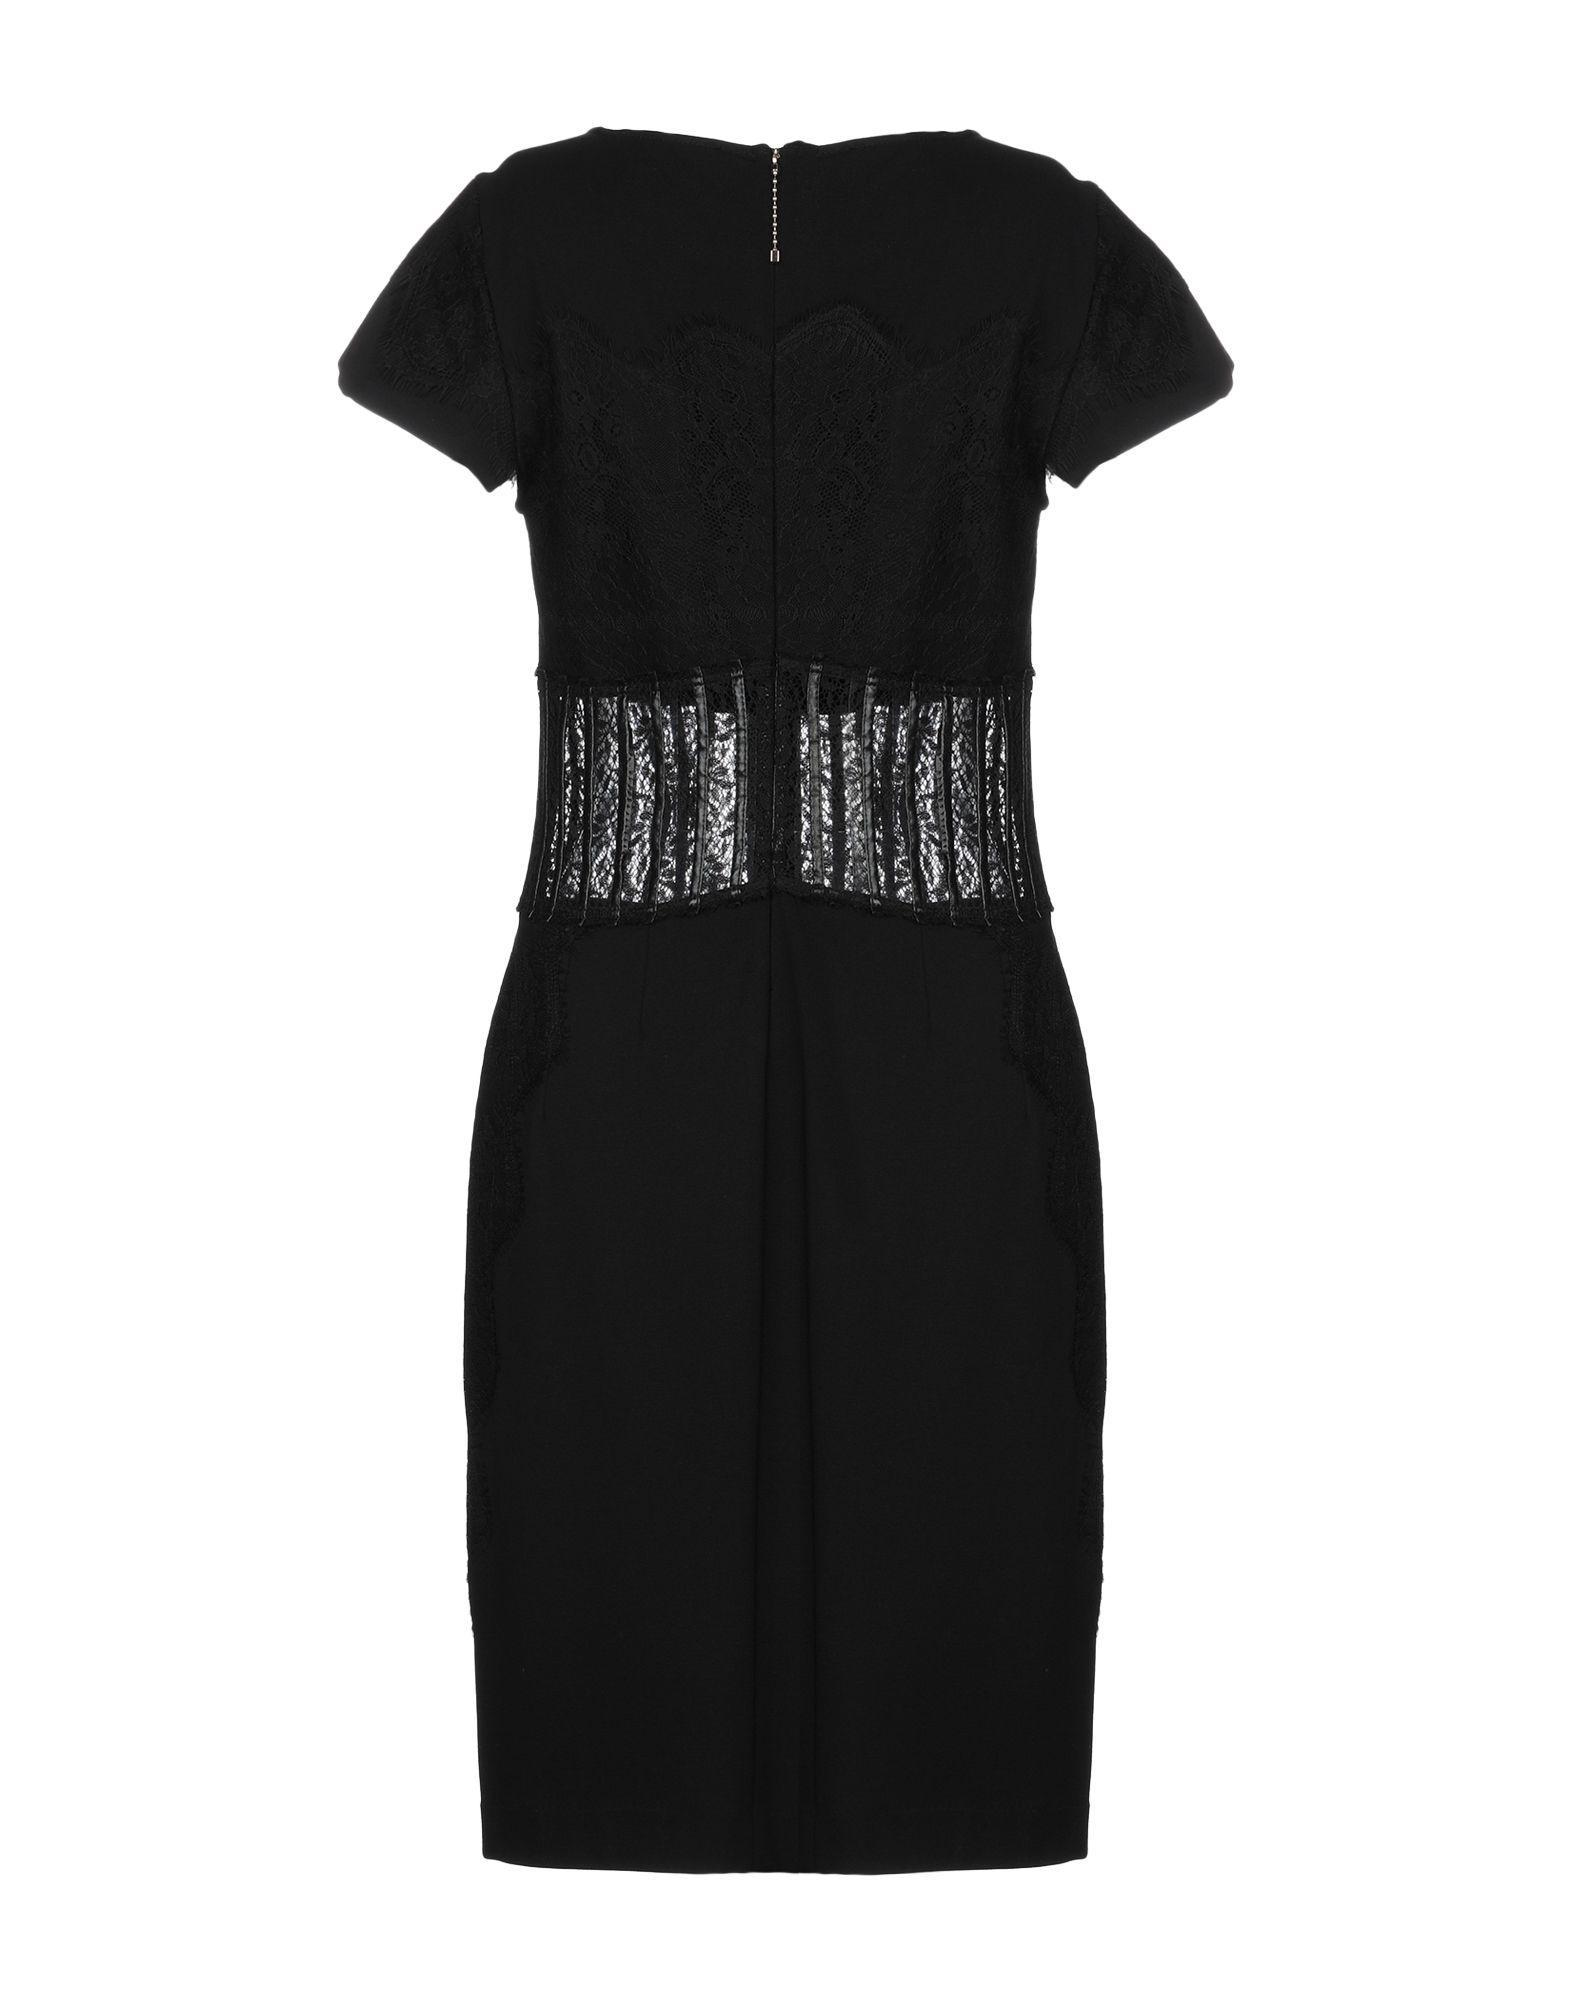 54aaa5bb324941 Lyst - Sonia Fortuna Knee-length Dress in Black